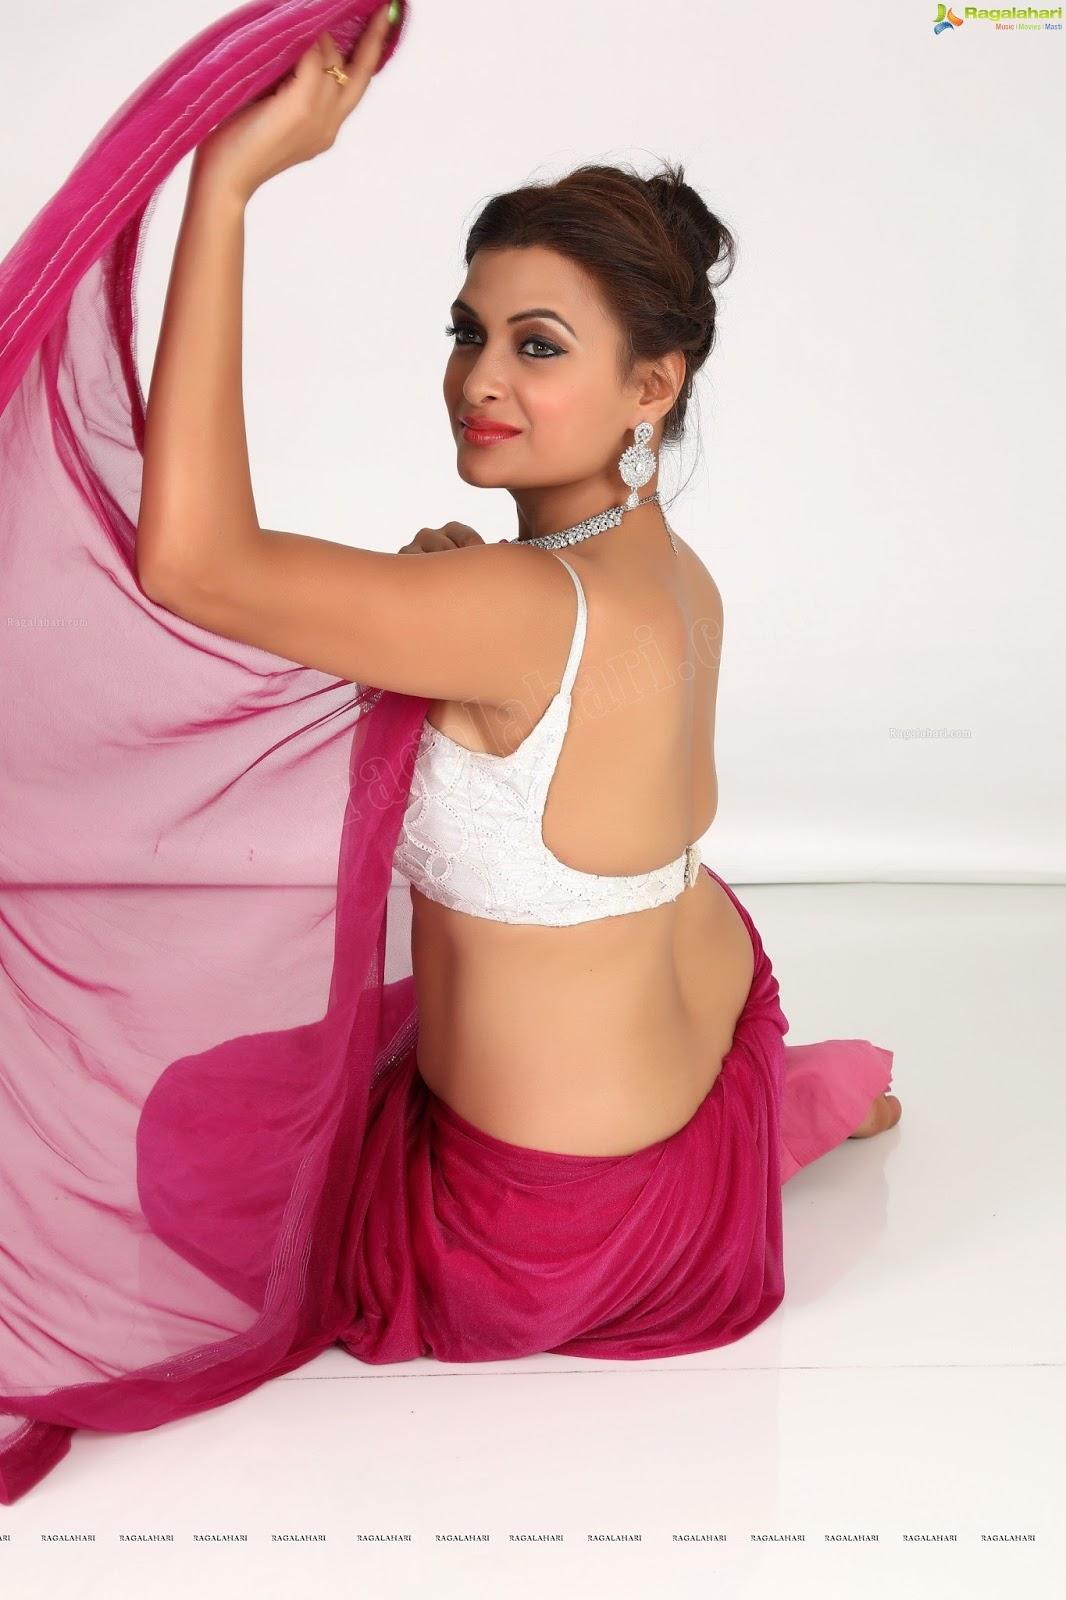 Saree Seduction Sathyamvada In Maroon Saree And Silver -7356